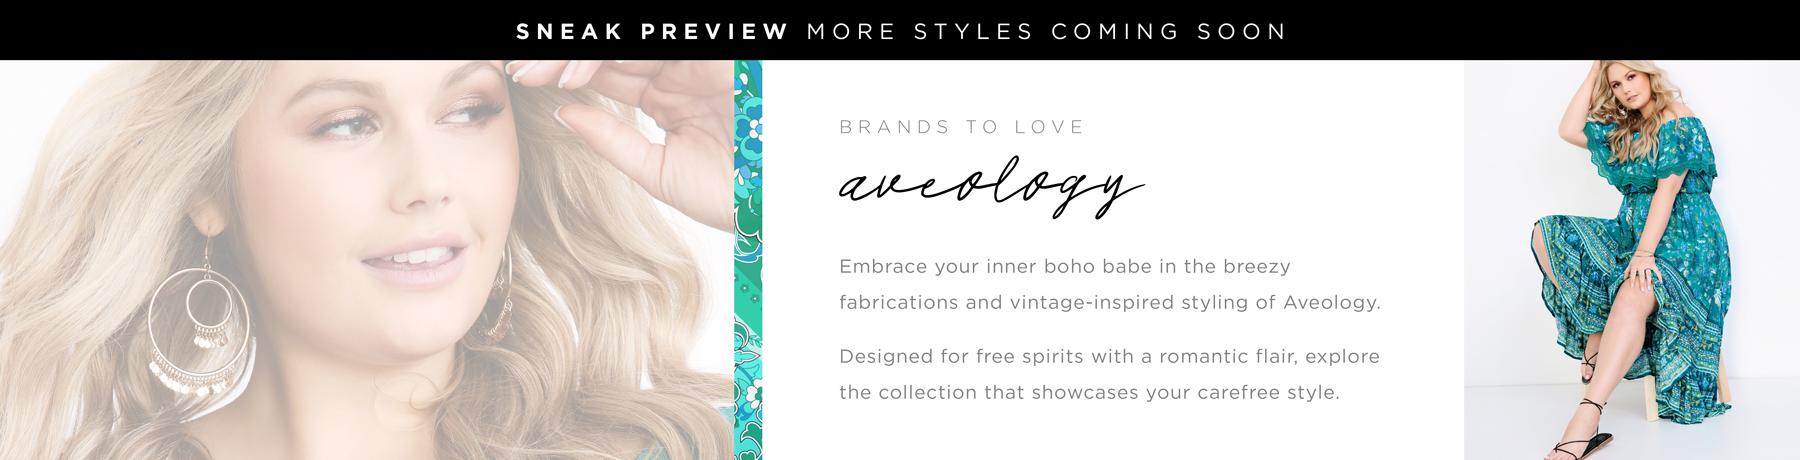 Aveology - Brands to Love